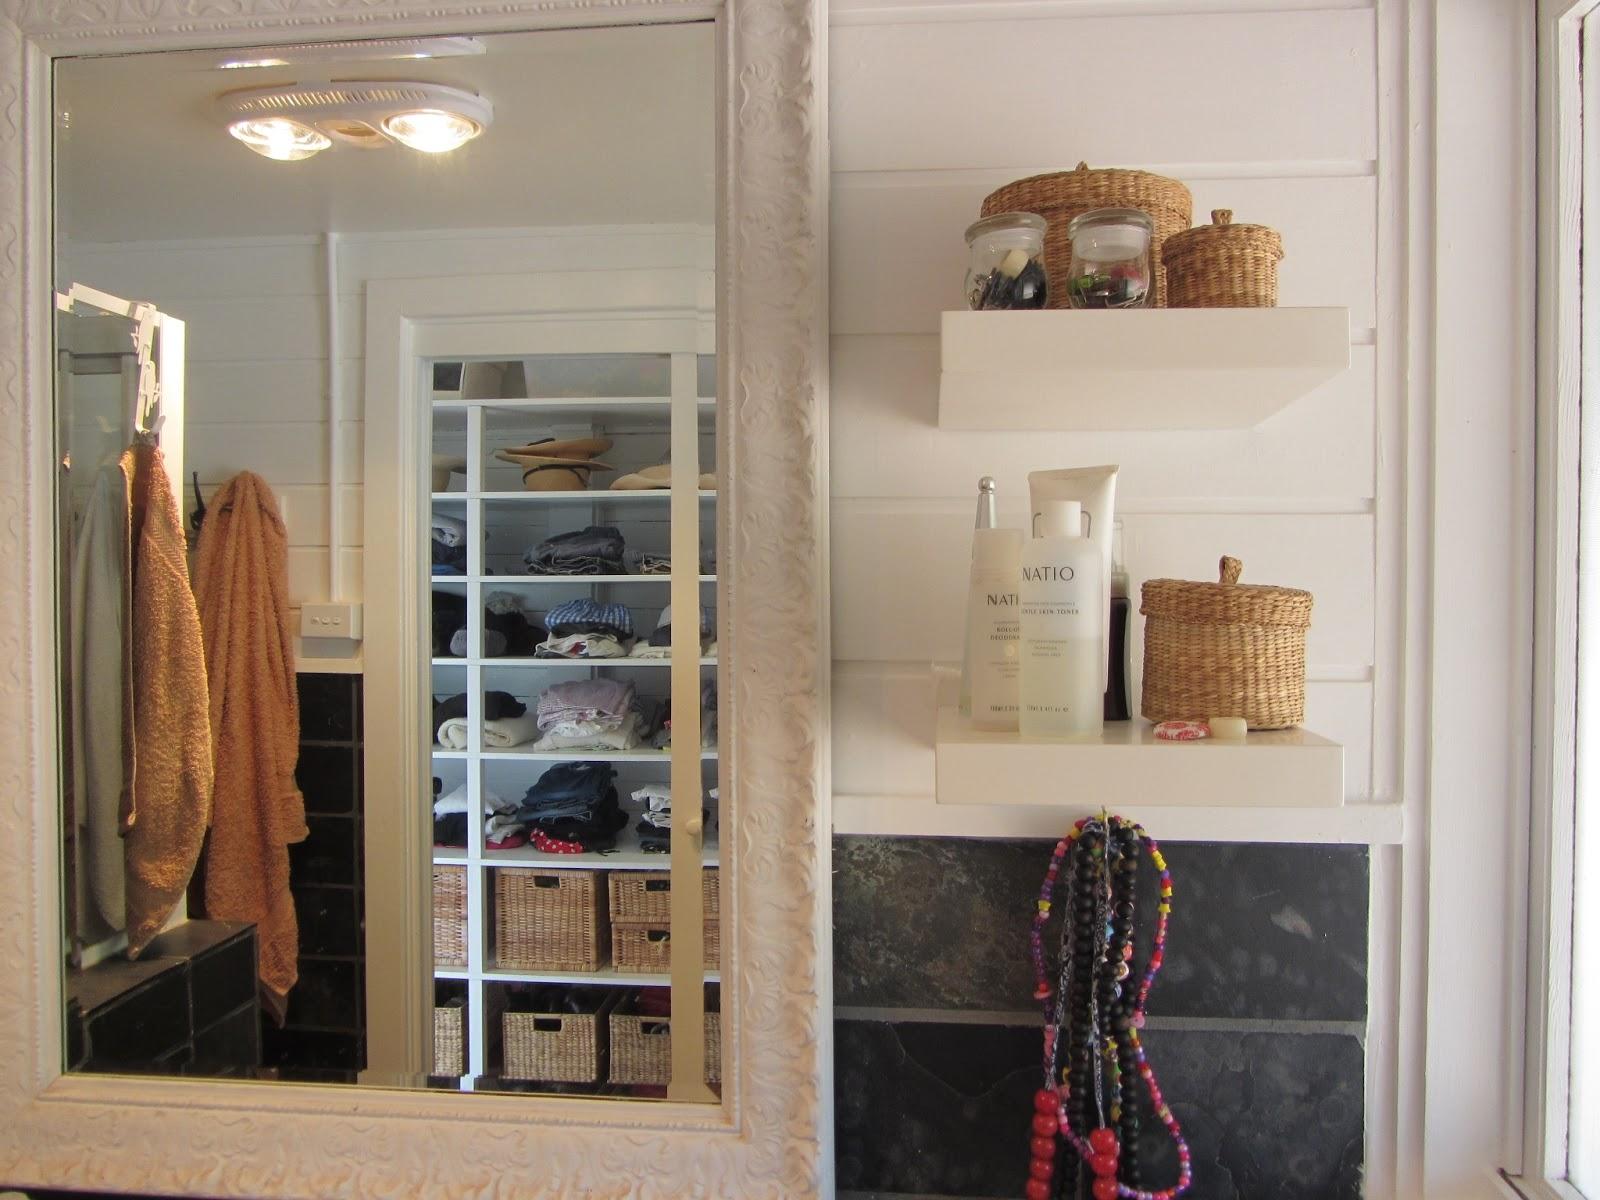 Mirror Lamps Shampoo Desk Towel Wall